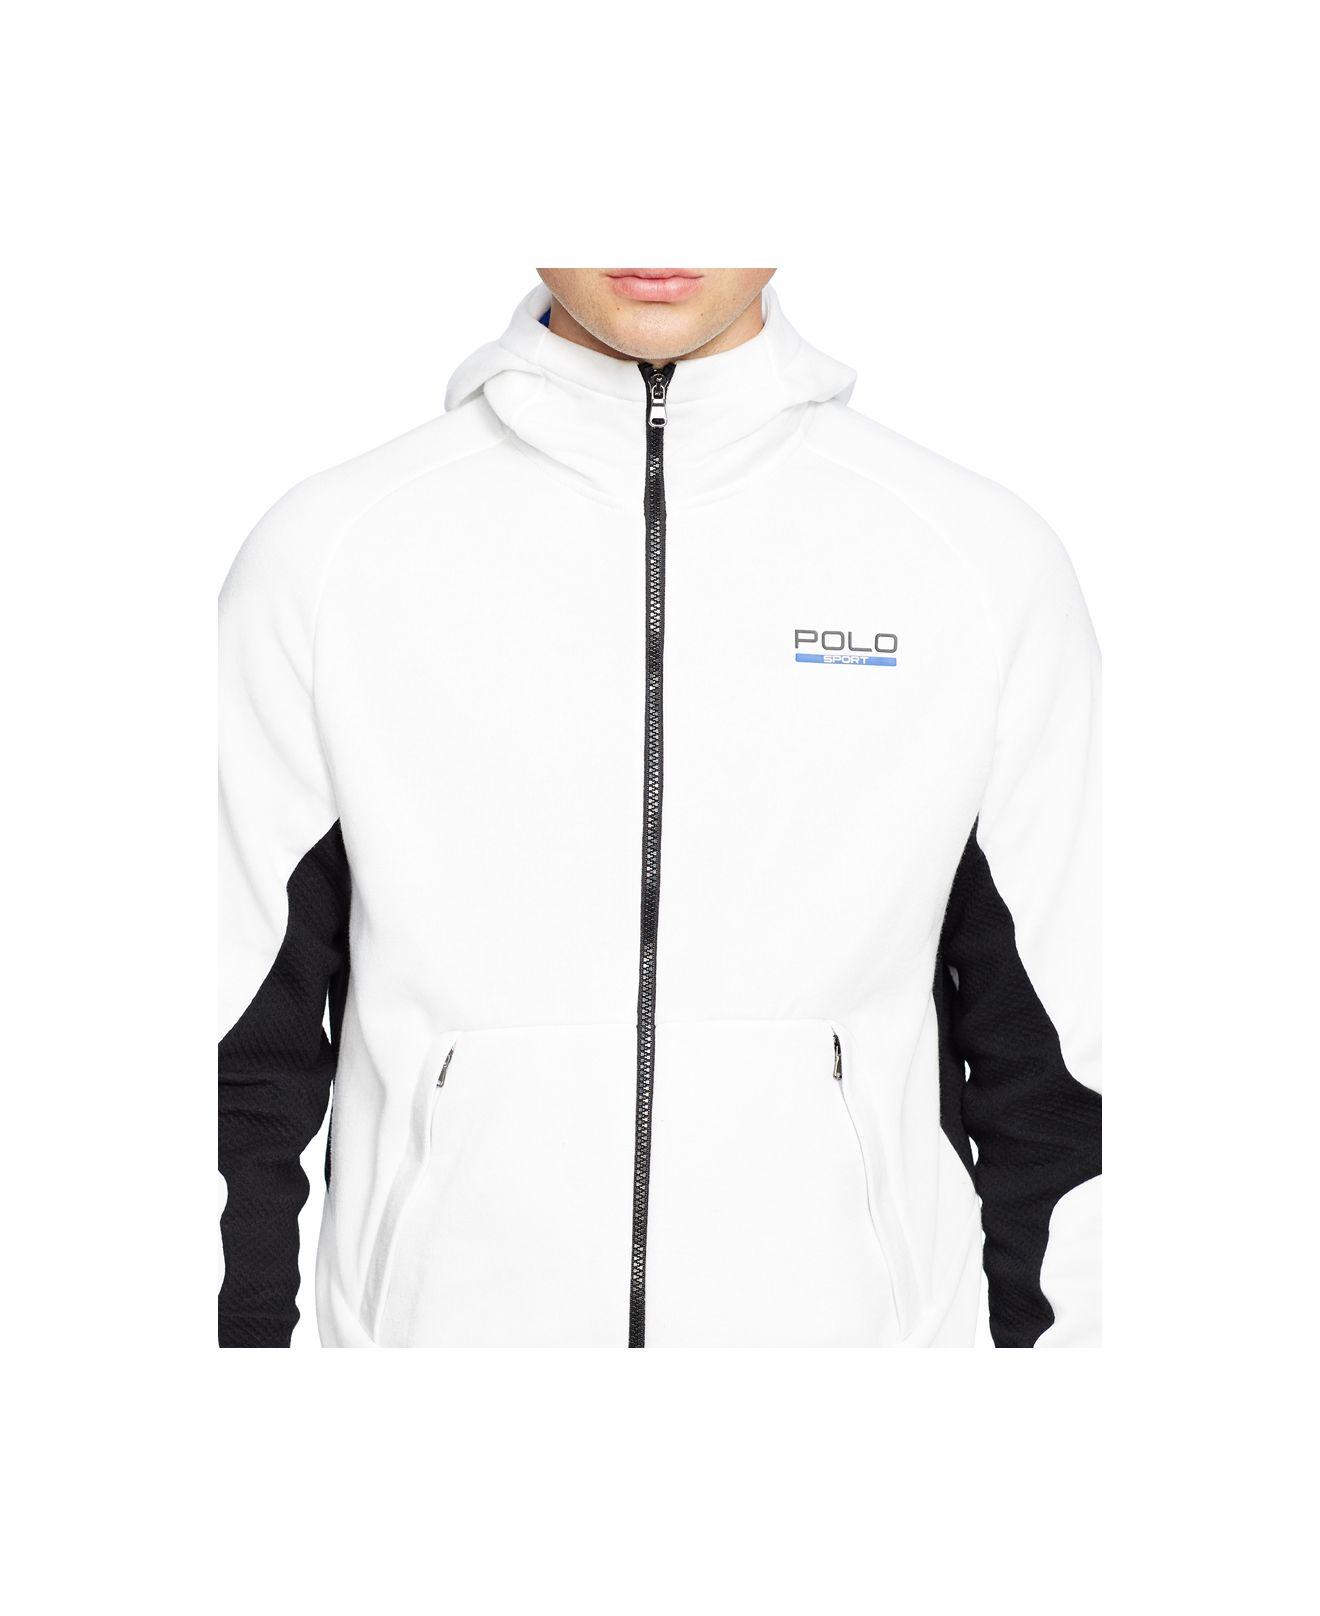 Lyst - Polo Ralph Lauren Polo Sport Men s Fleece Zip Up Hoodie in Black for  Men 5415219a4a89